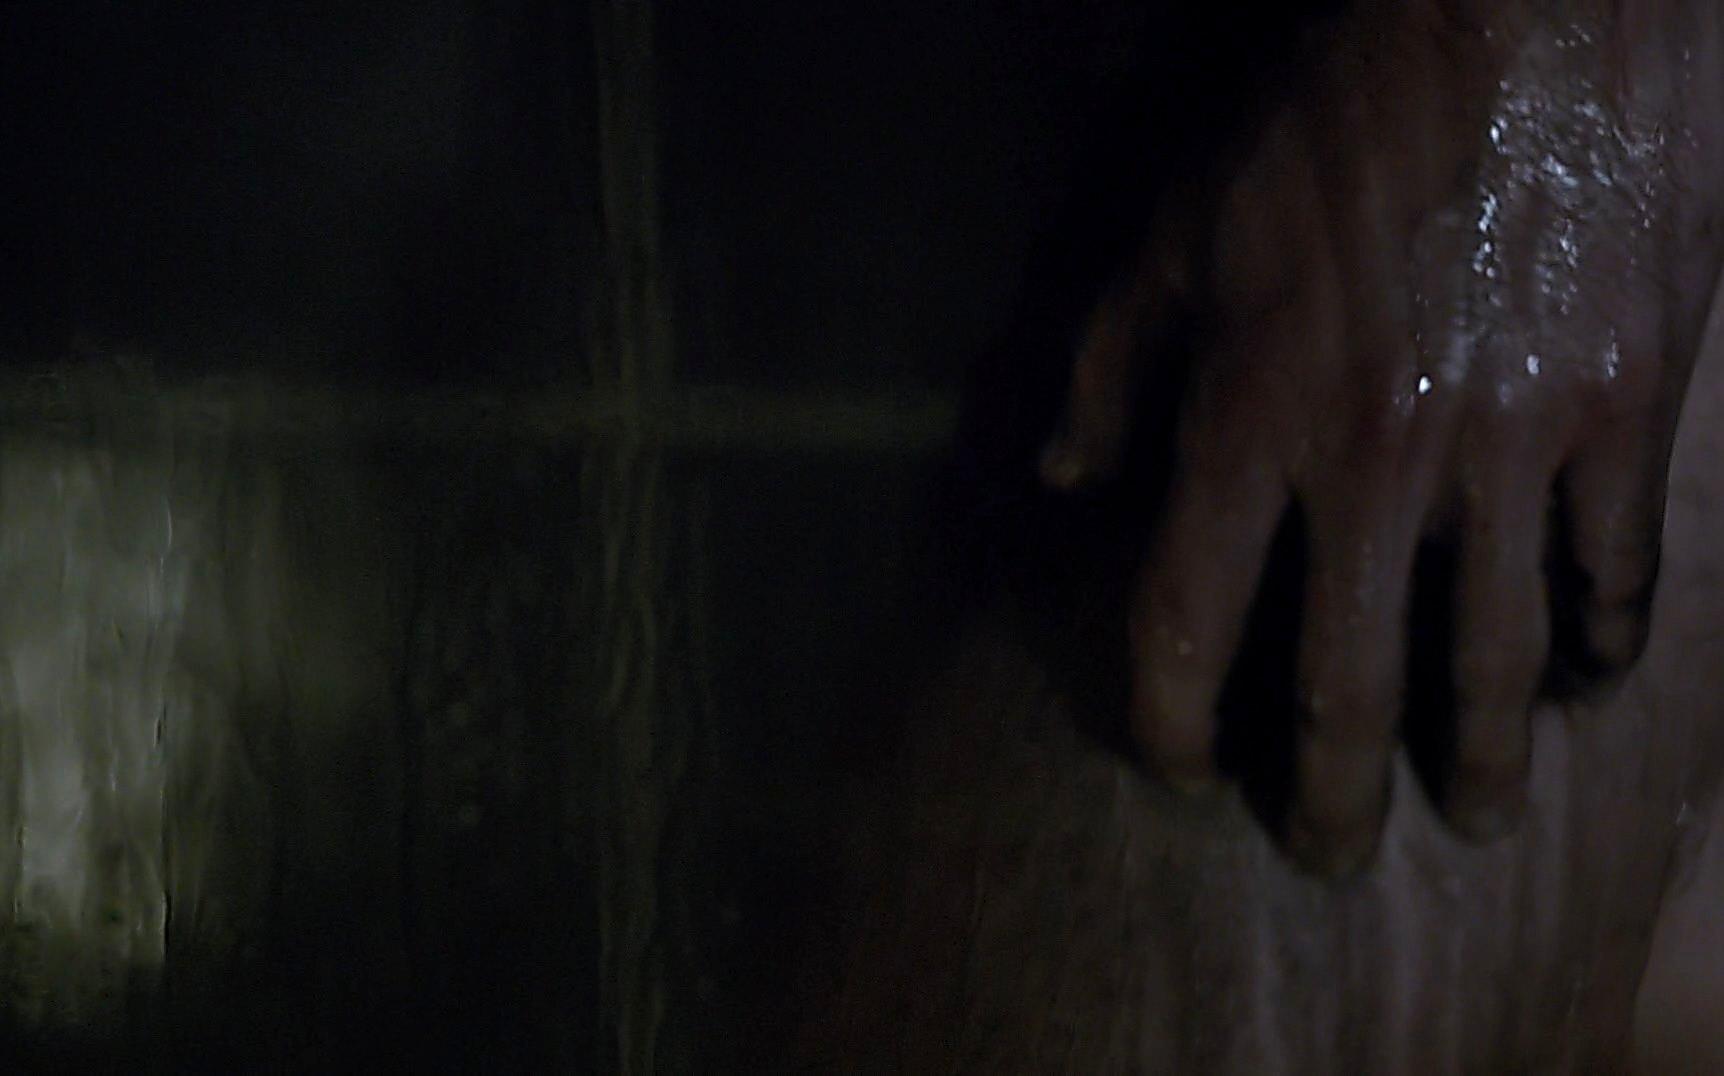 Ryan Kelley sexy shirtless scene August 11, 2015, 11pm